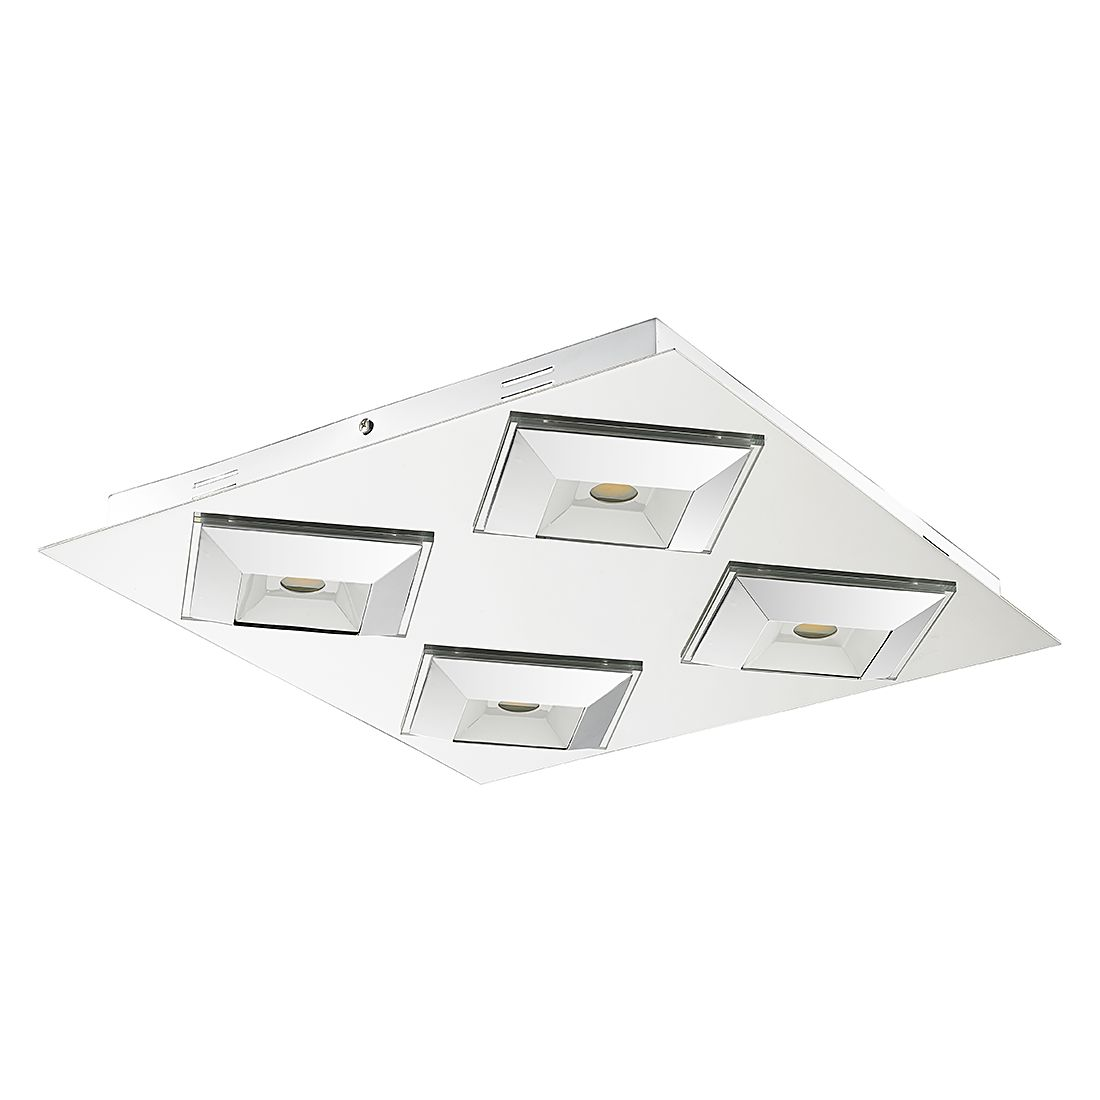 EEK A+, LED Deckenleuchte Senses – Metall – 4-flammig, Sorpetaler günstig